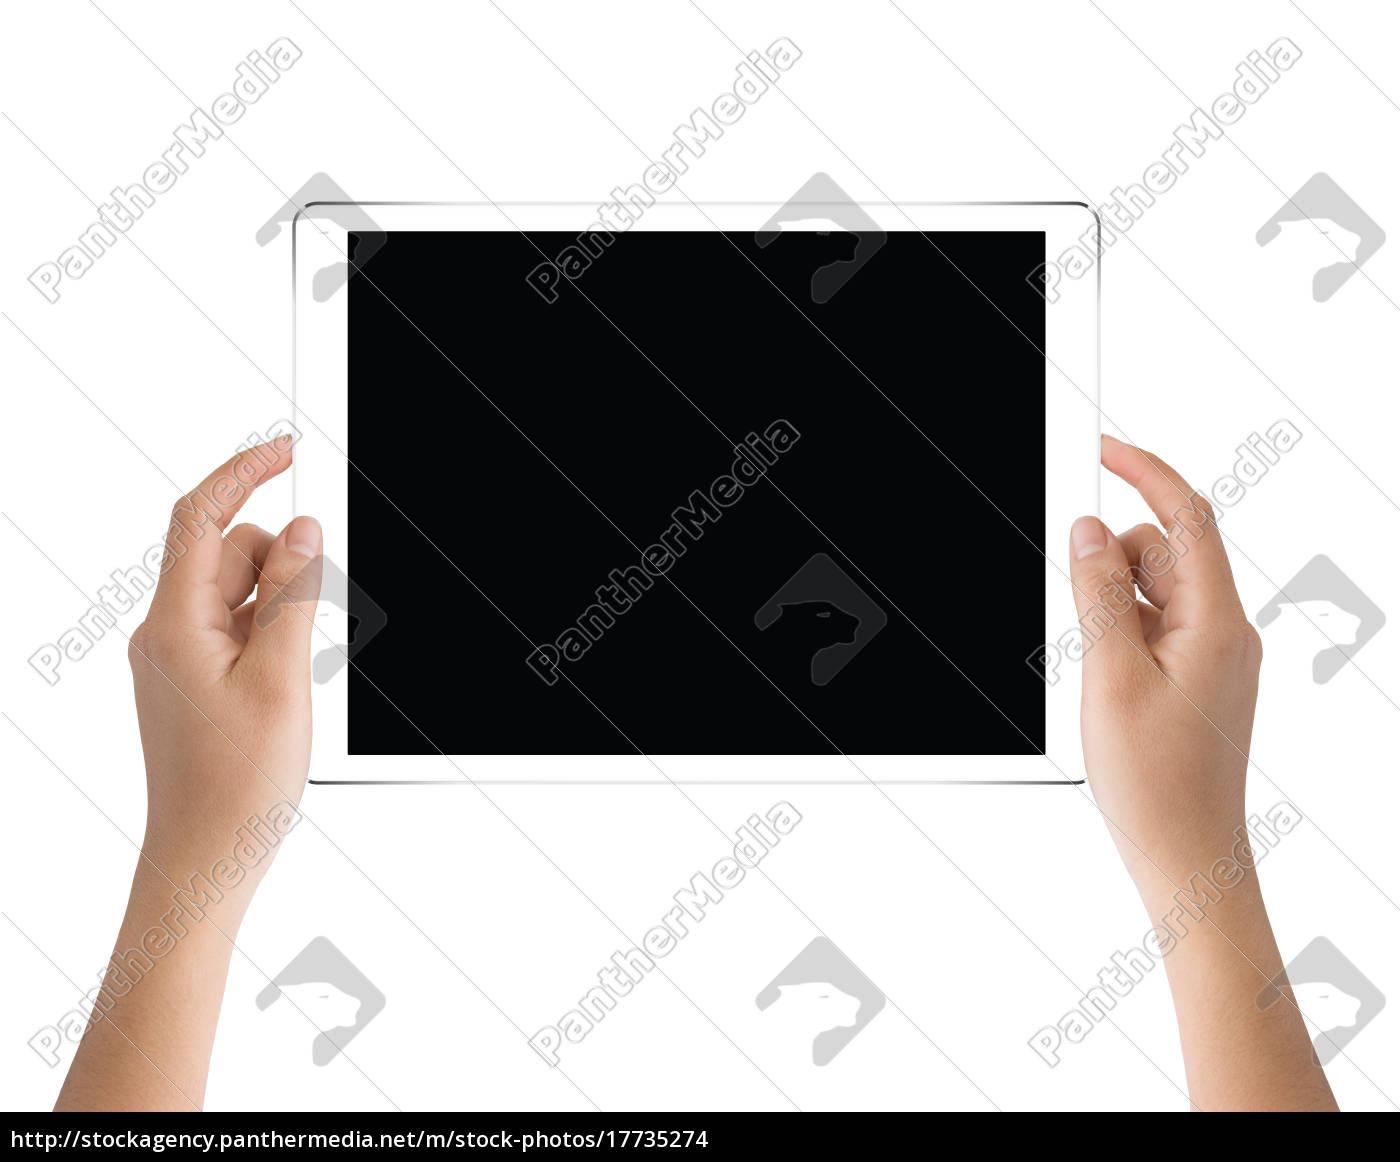 mano, sosteniendo, tableta, negra, aislada, en - 17735274